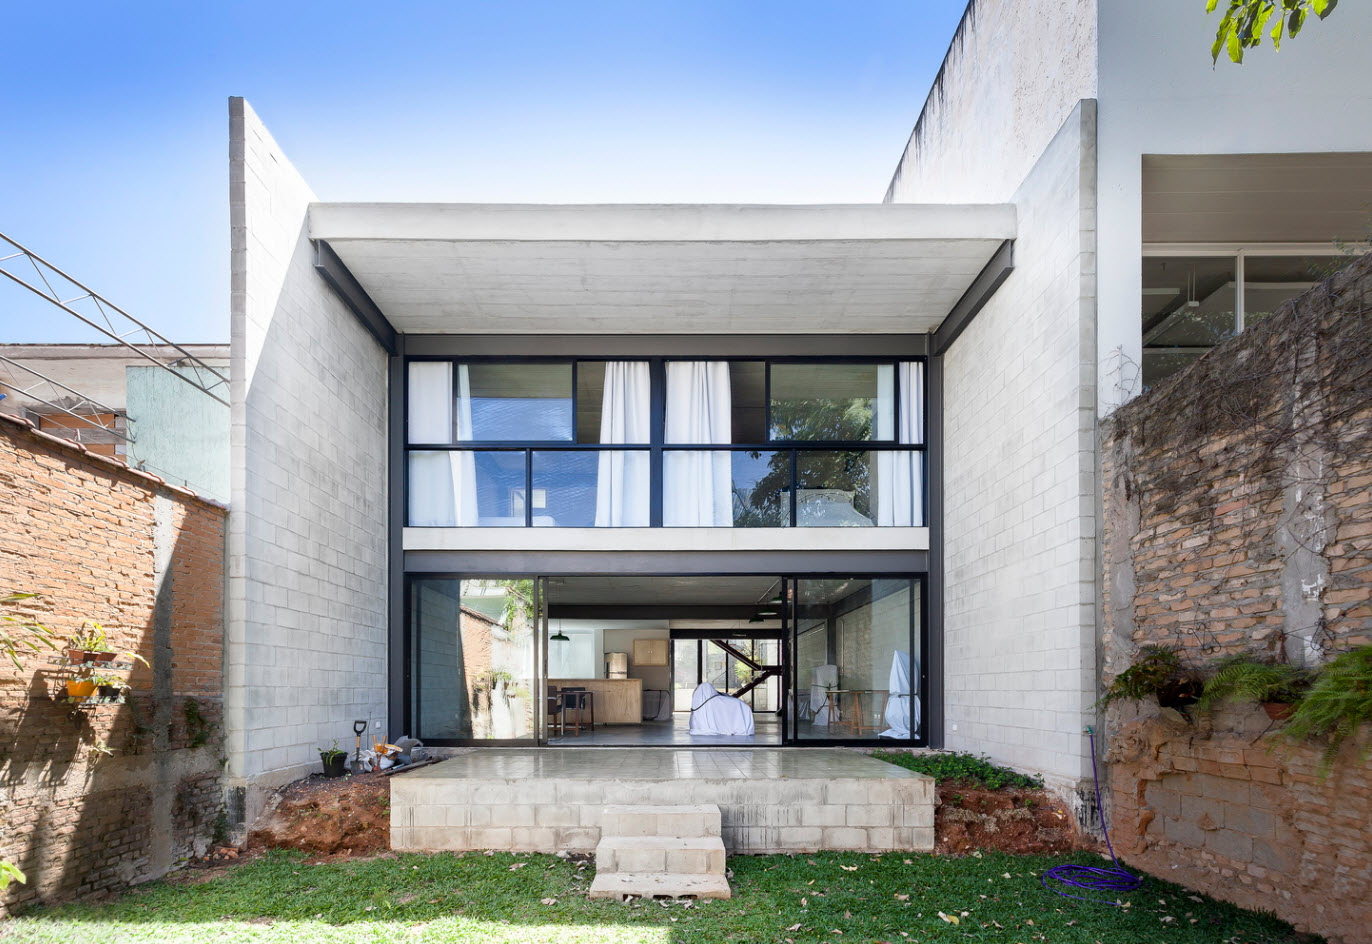 Dise o casa econ mica de dos pisos for Fachadas de casas bonitas y economicas